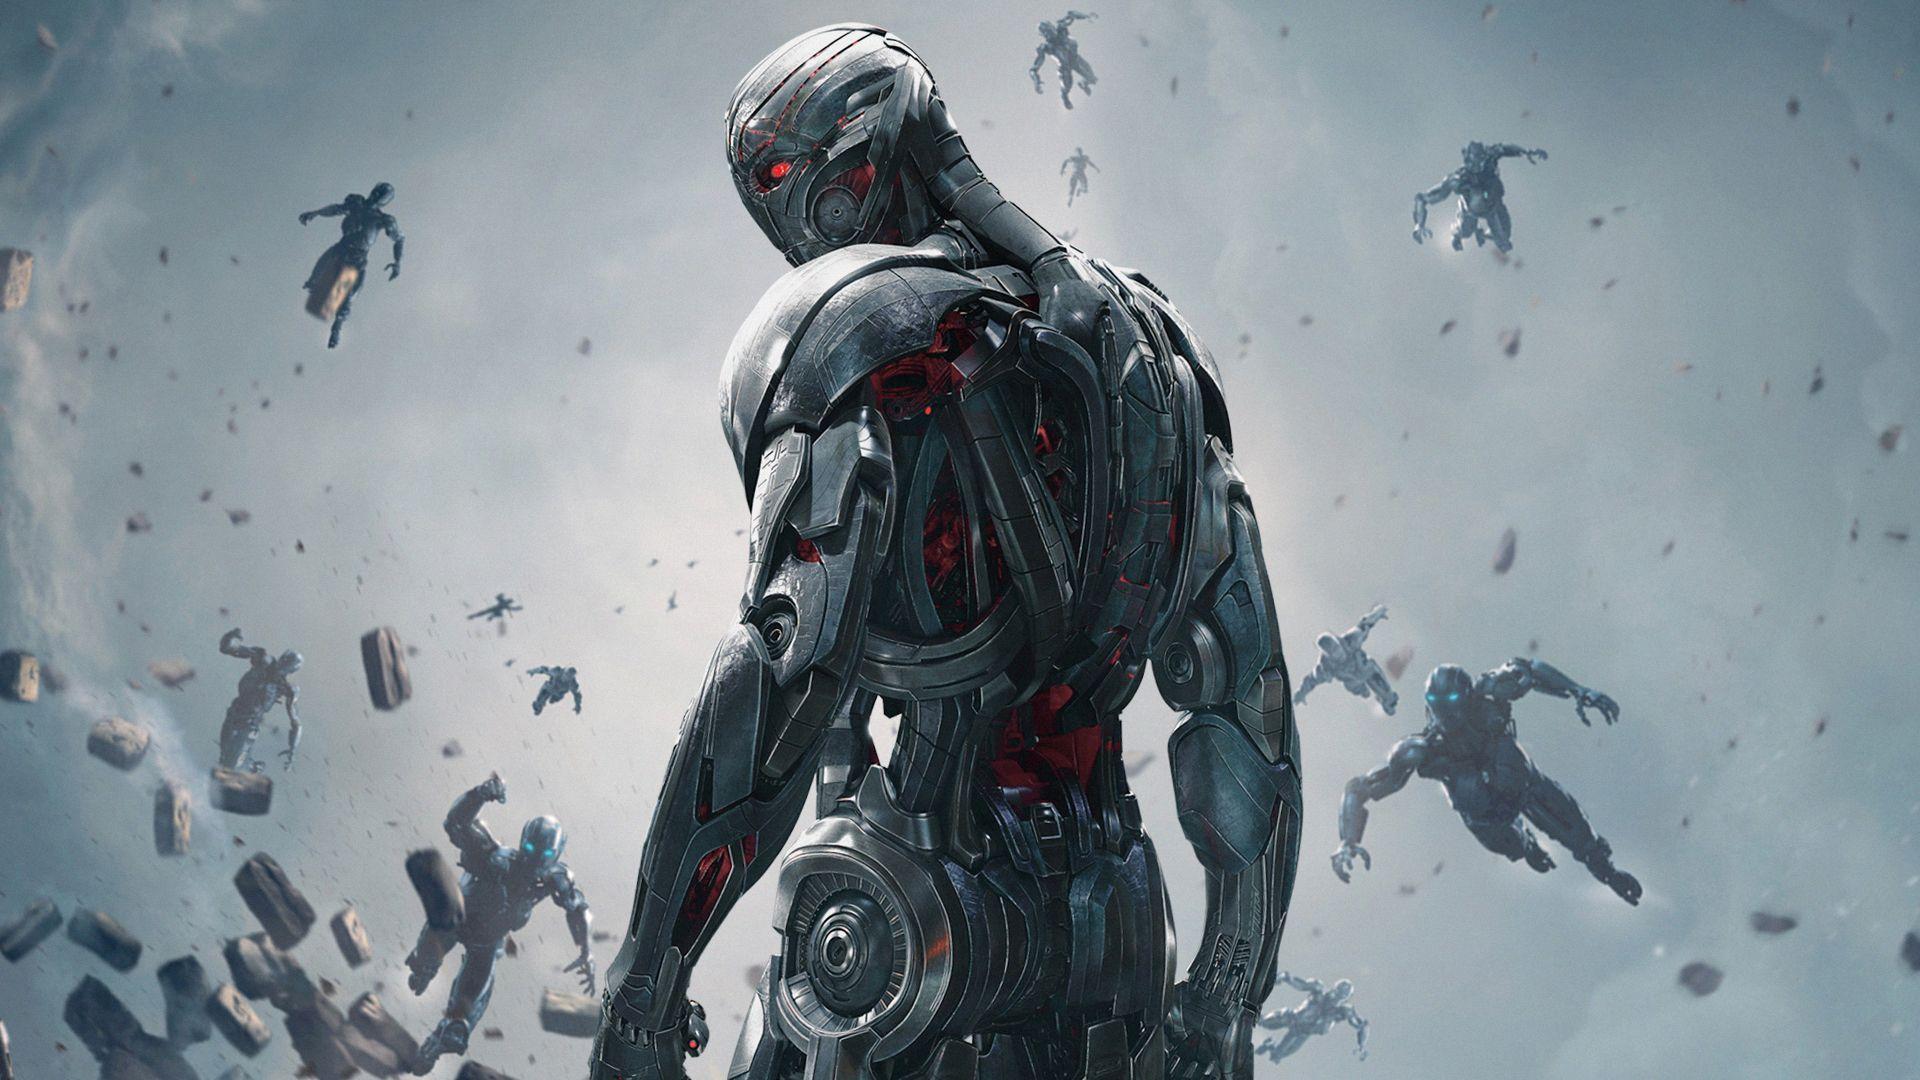 Fiction Wallpaper Hd Avengers Age Of Ultron Wallpaper High